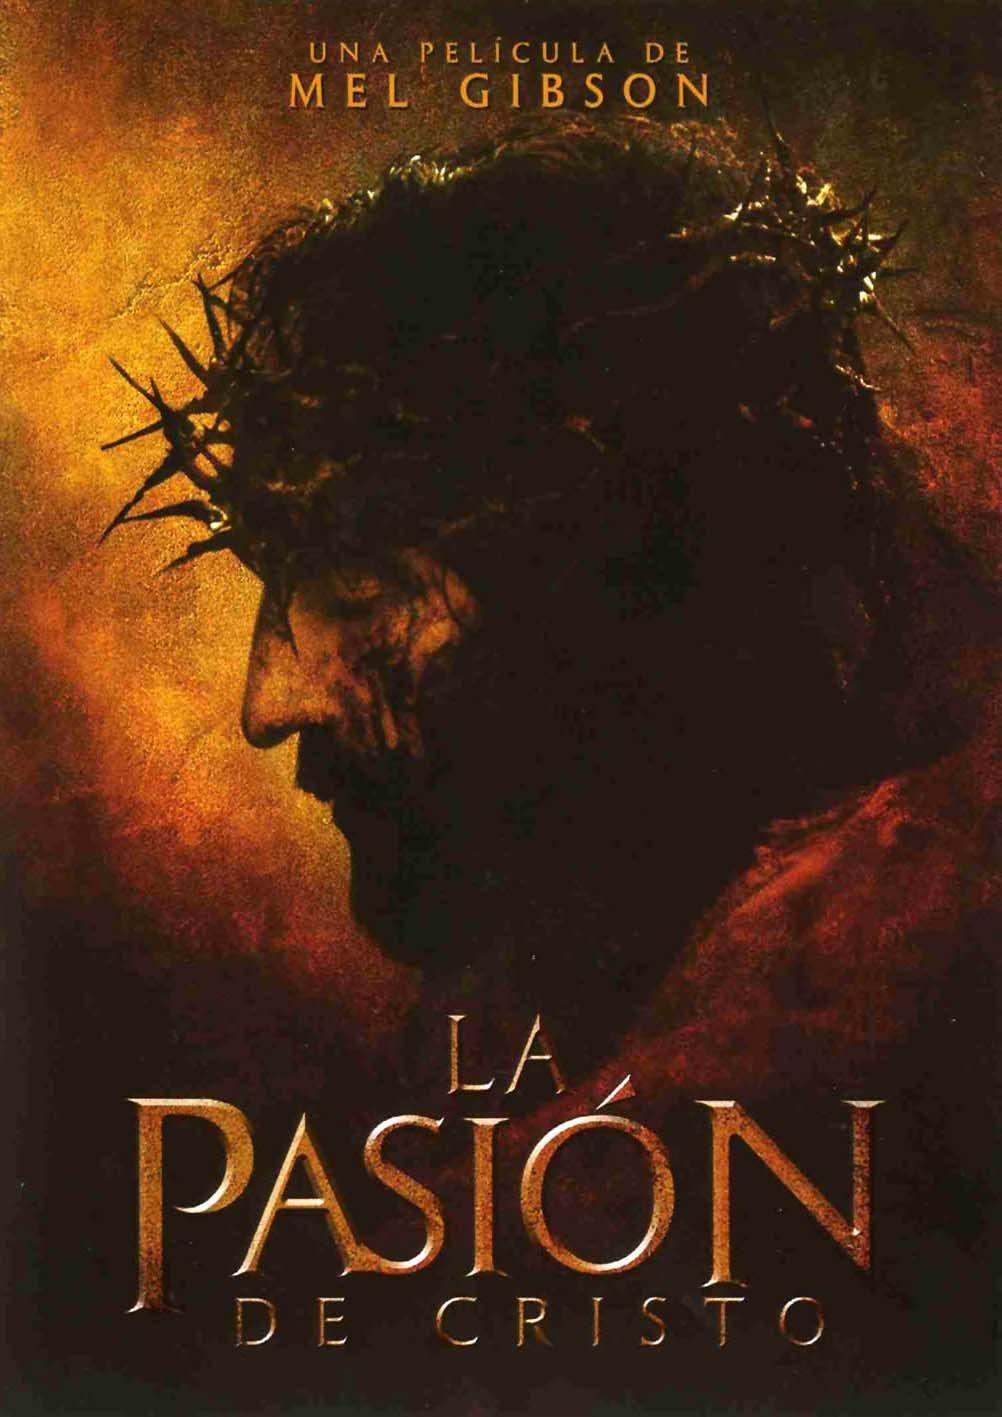 La Pasion De Cristo Video Una Pelicula De Mel Gibson Madrid Aurum 2009 Christ Movie Christian Movies Christian Films